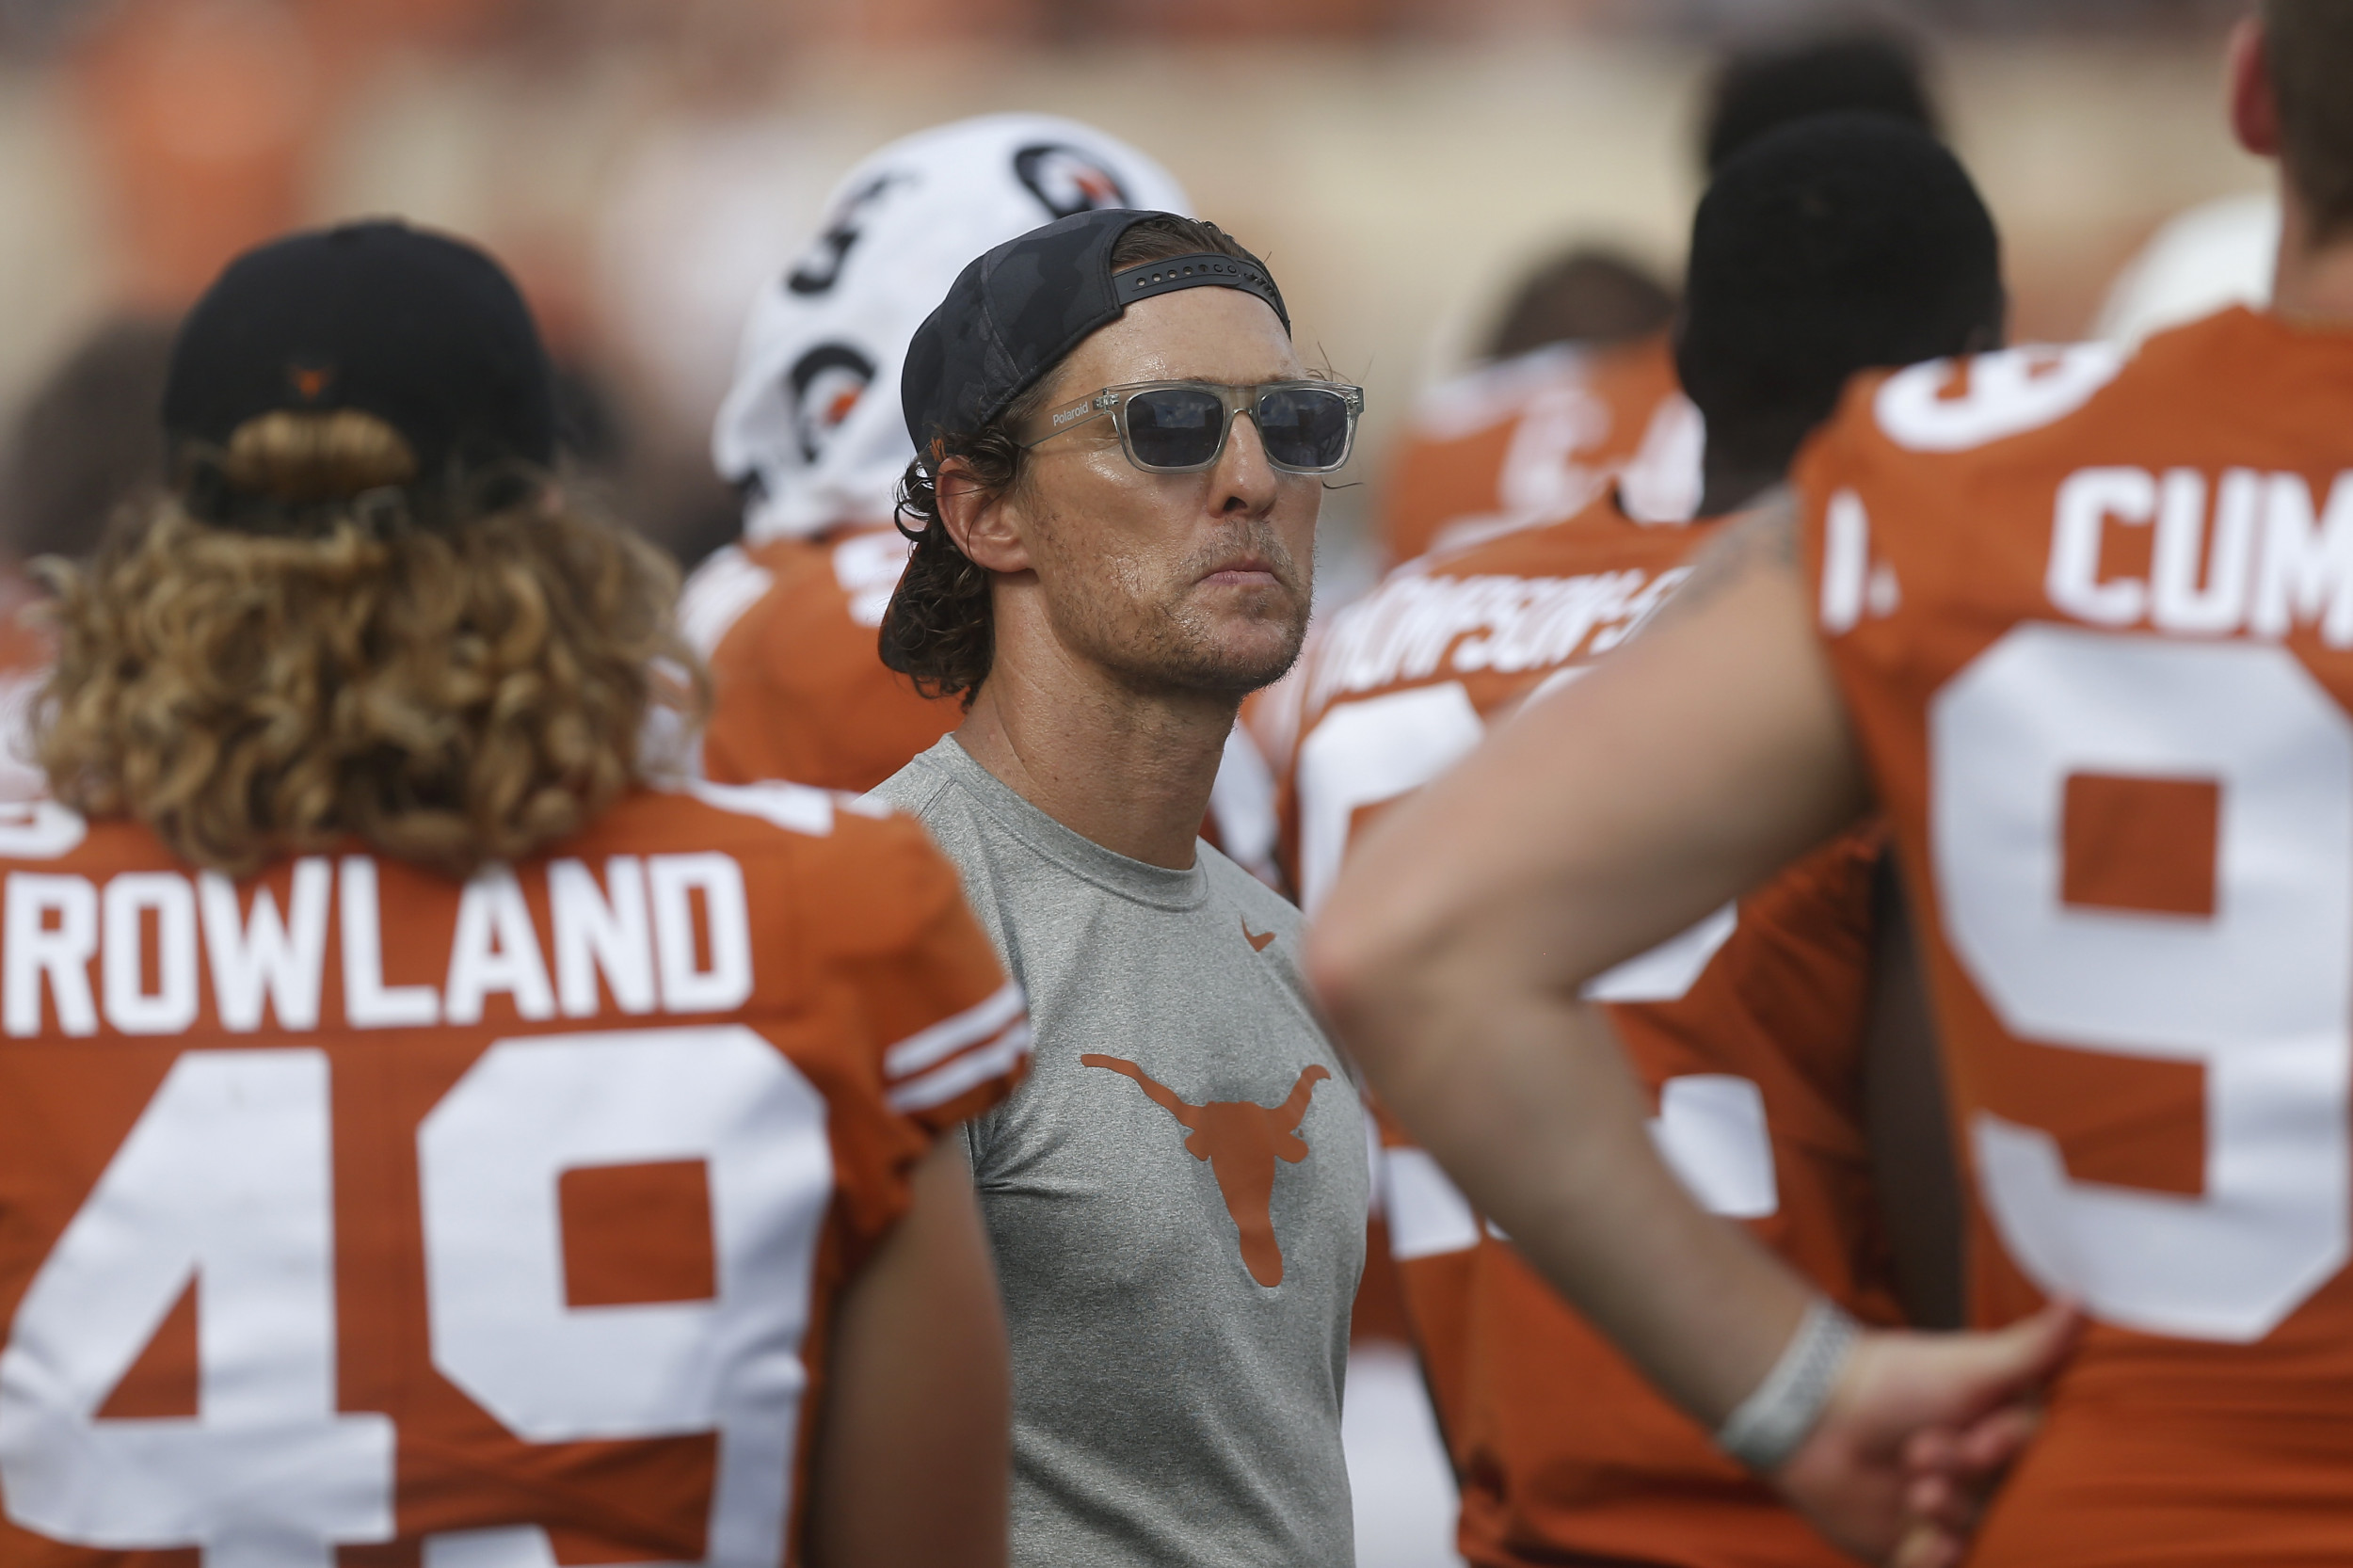 Matthew McConaughey wearing Texas Nike Tee and Cap